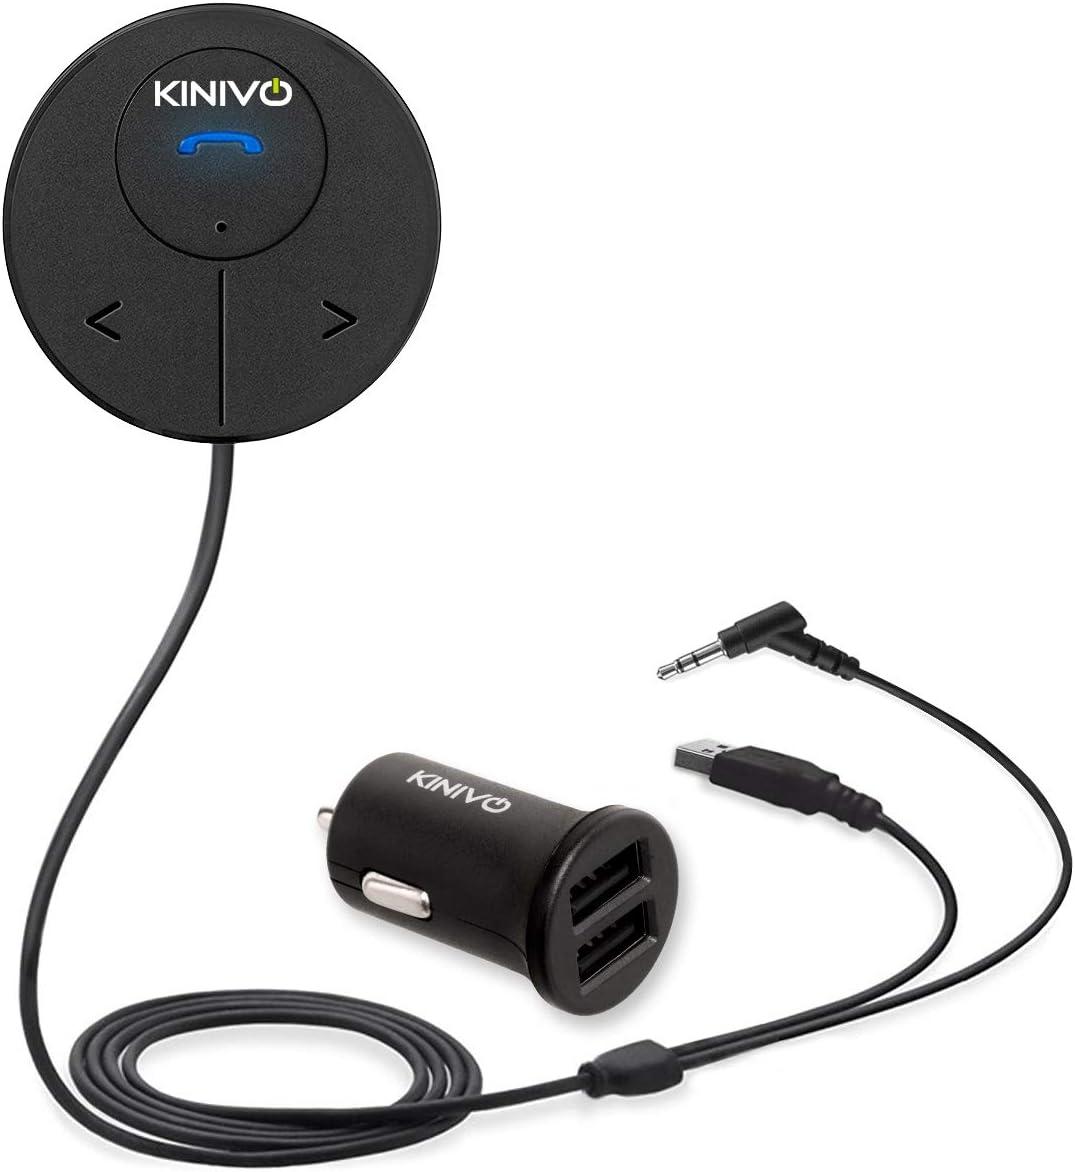 Kinivo Btc480 Bluetooth Hands Free Car Receiver With Elektronik